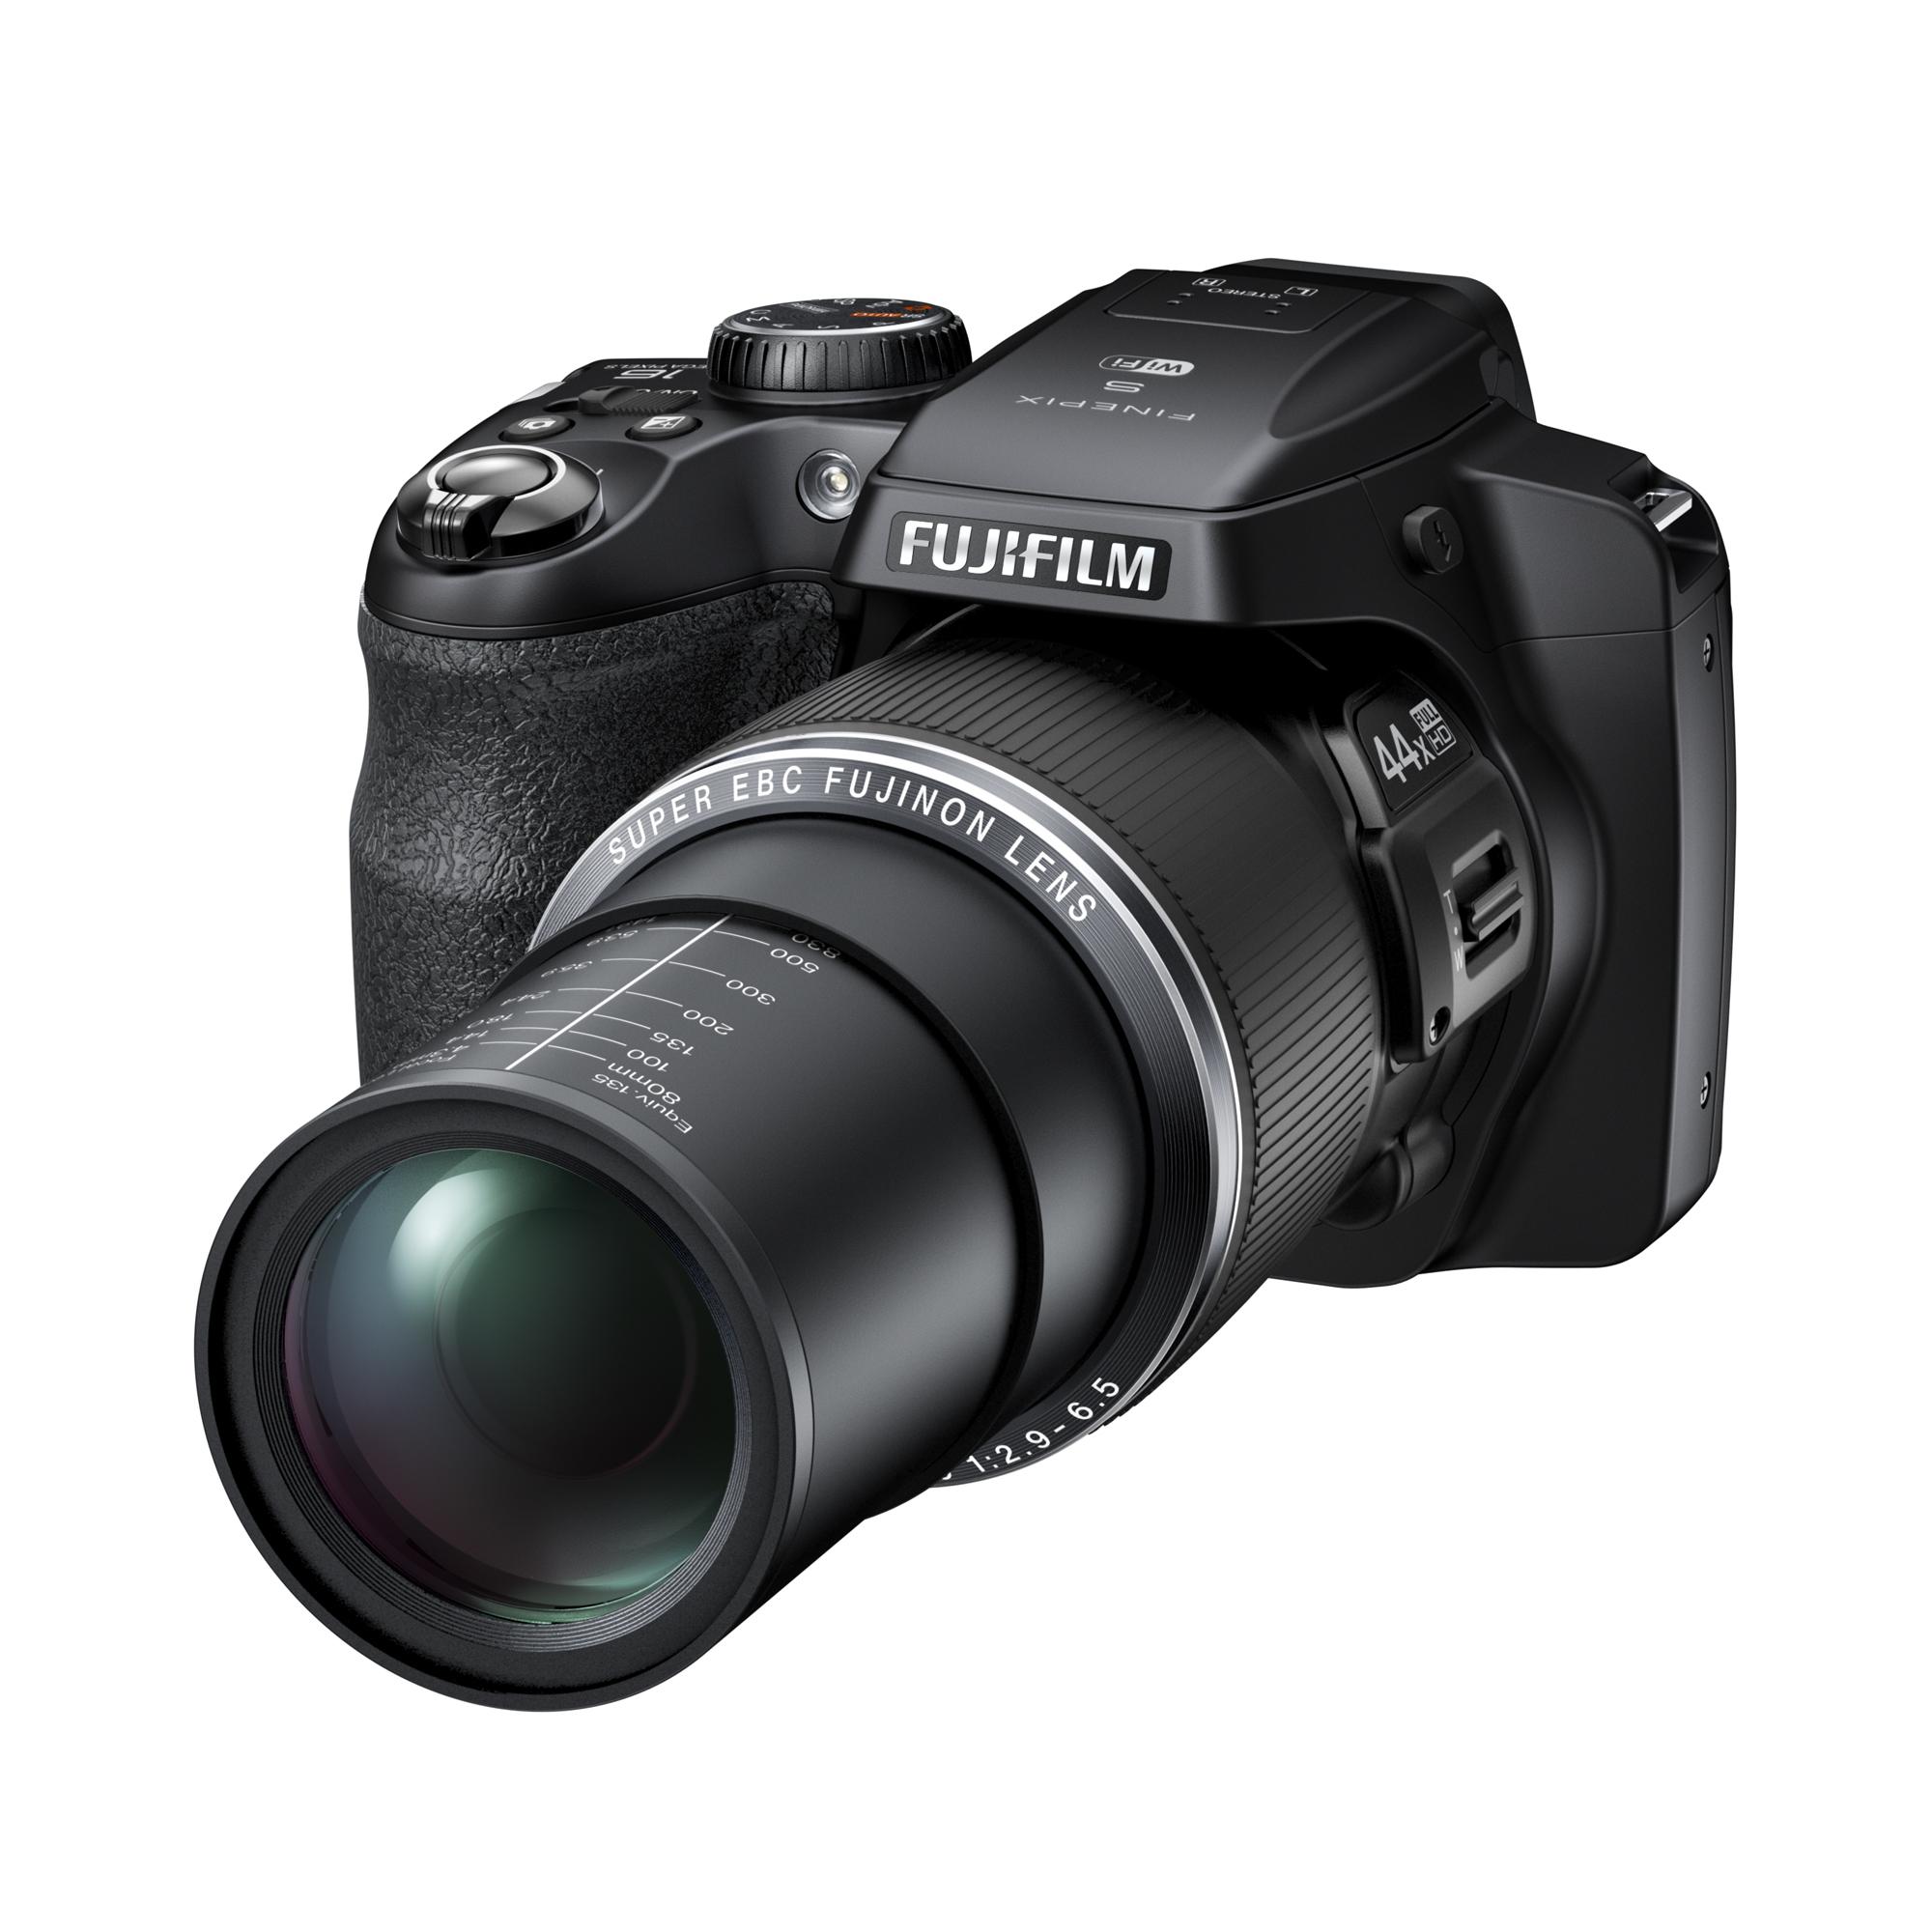 Fujifilm: 44fach-Zoom in Bridgekamera mit WLAN - Fujifilm Finepix S8400W (Bild: Fujifilm)